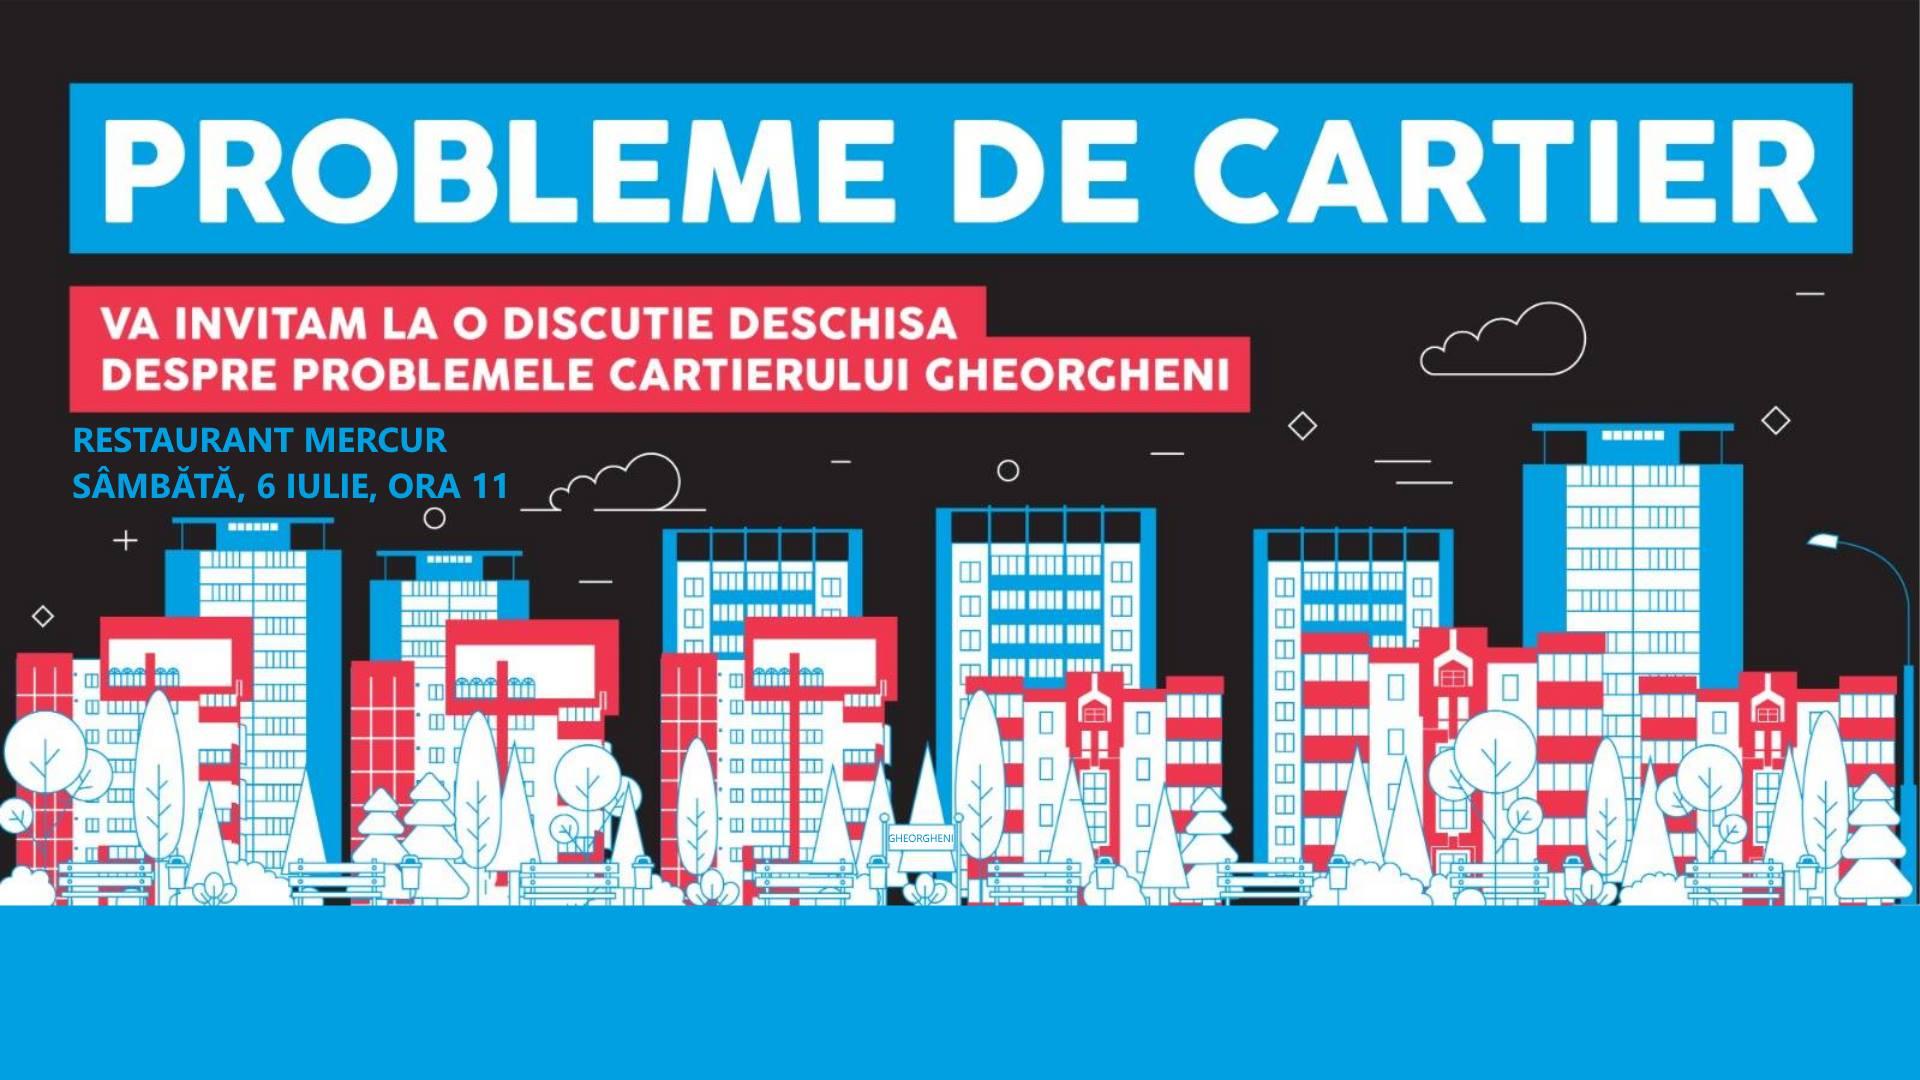 Probleme de cartier: Gheorgheni